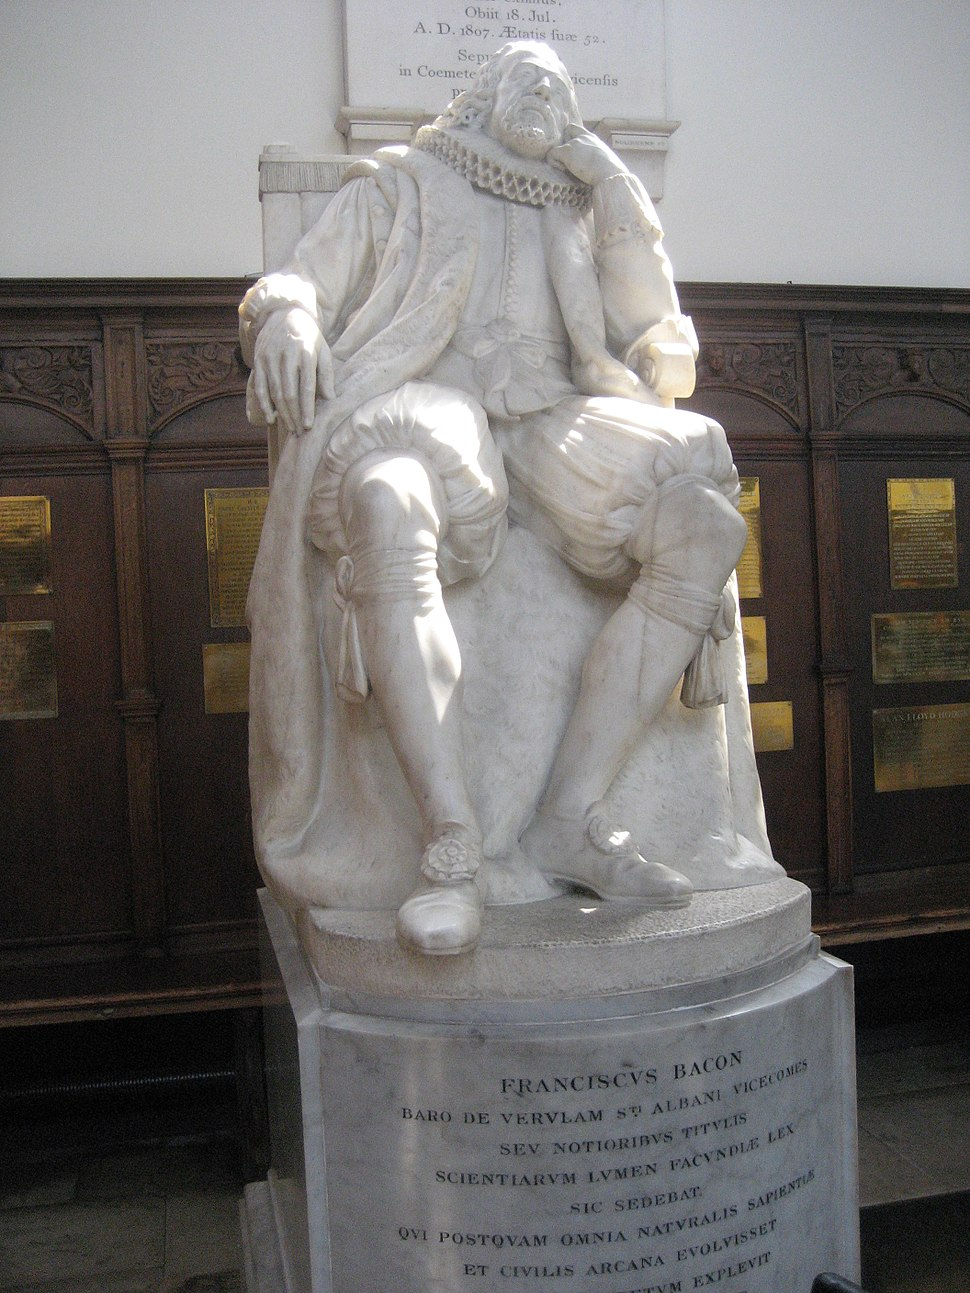 Statue of Francis Bacon in Trinity College, Cambridge